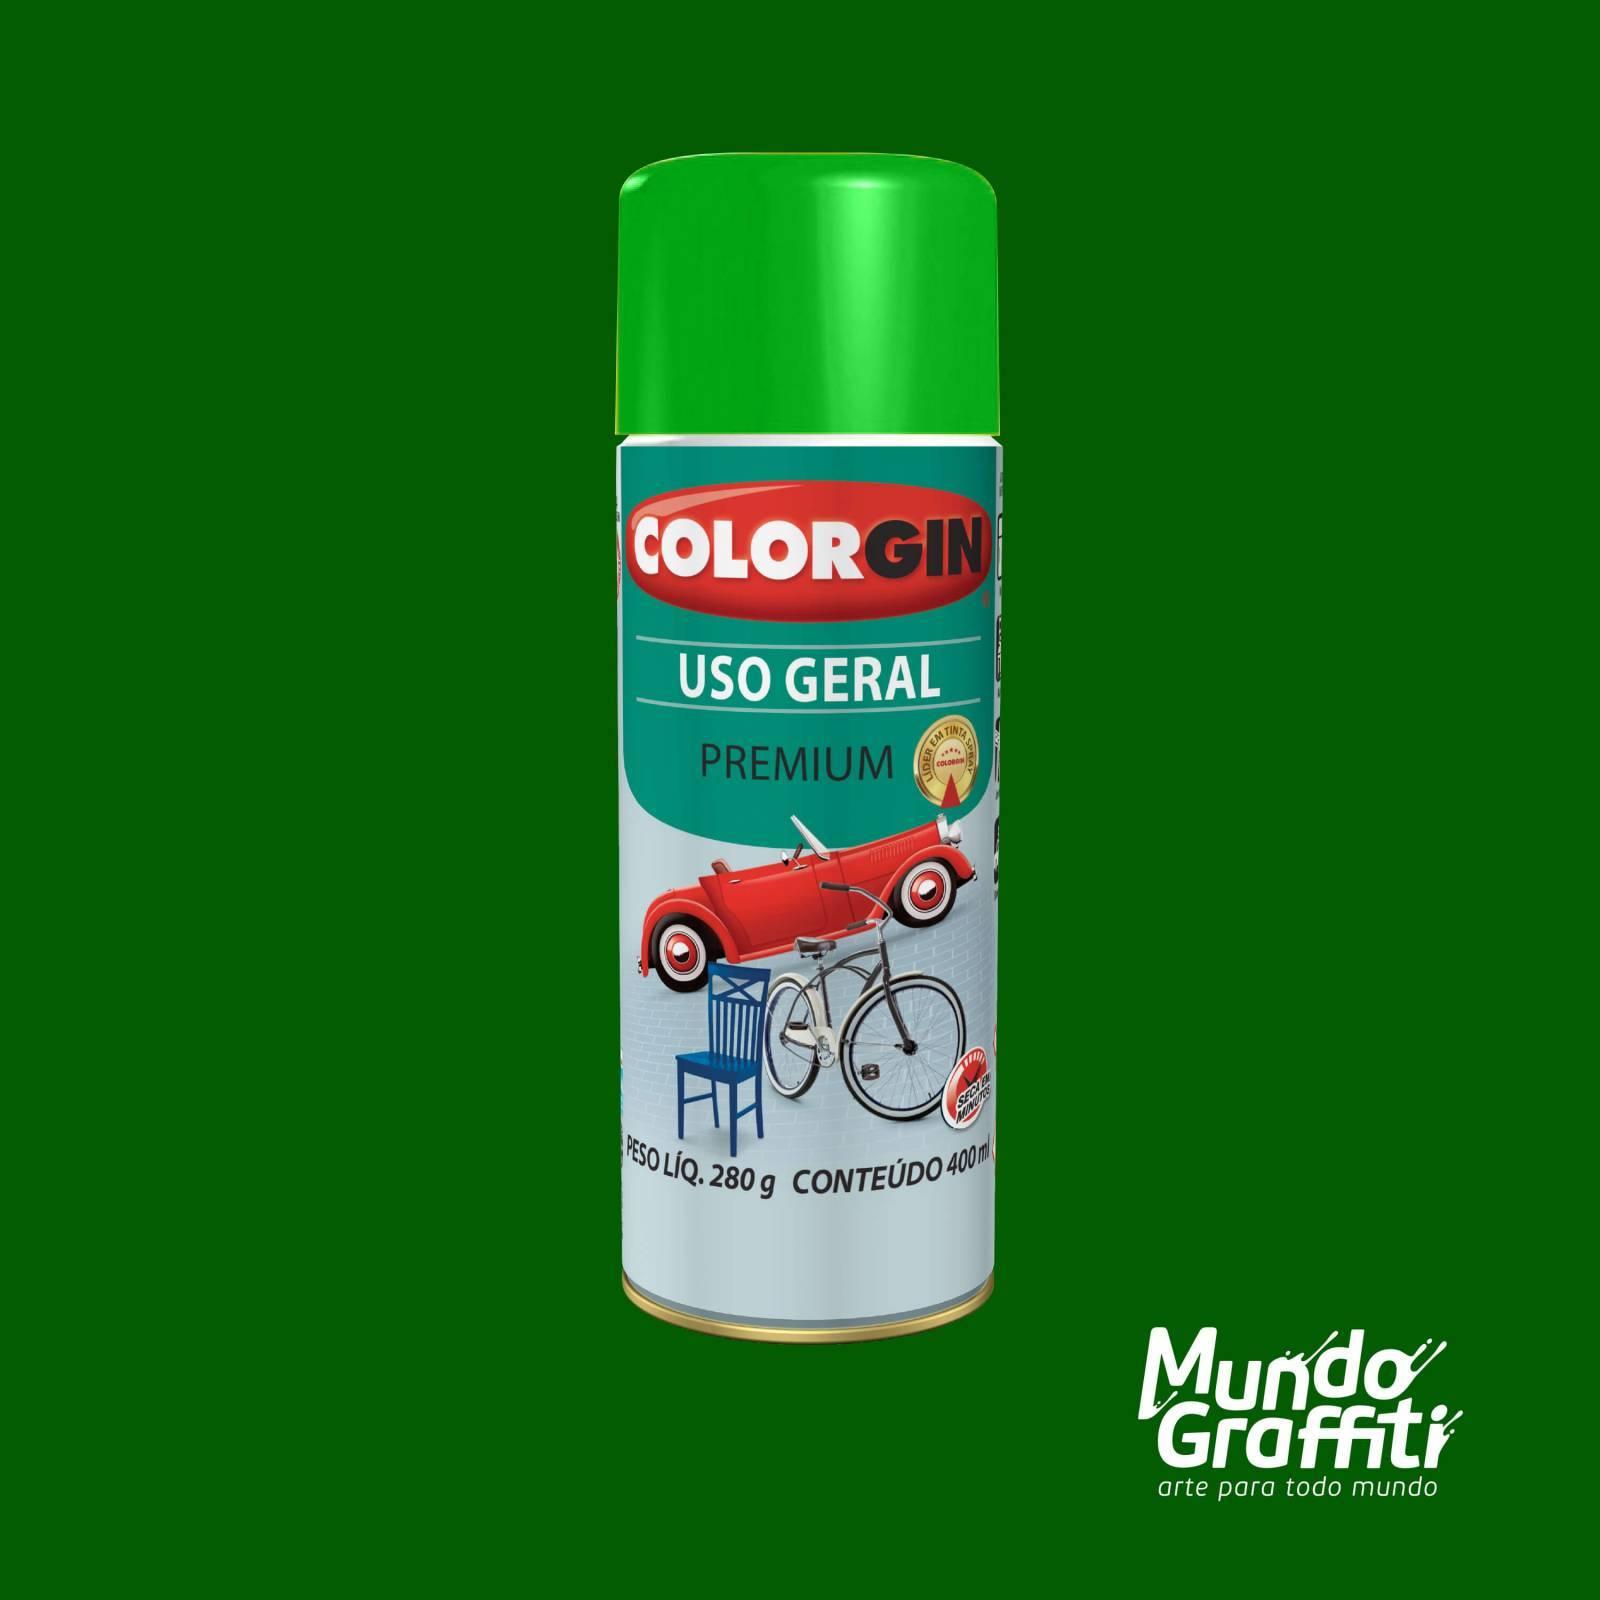 Tinta Spray Colorgin Uso Geral 55091 Verde 400ml - Mundo Graffiti